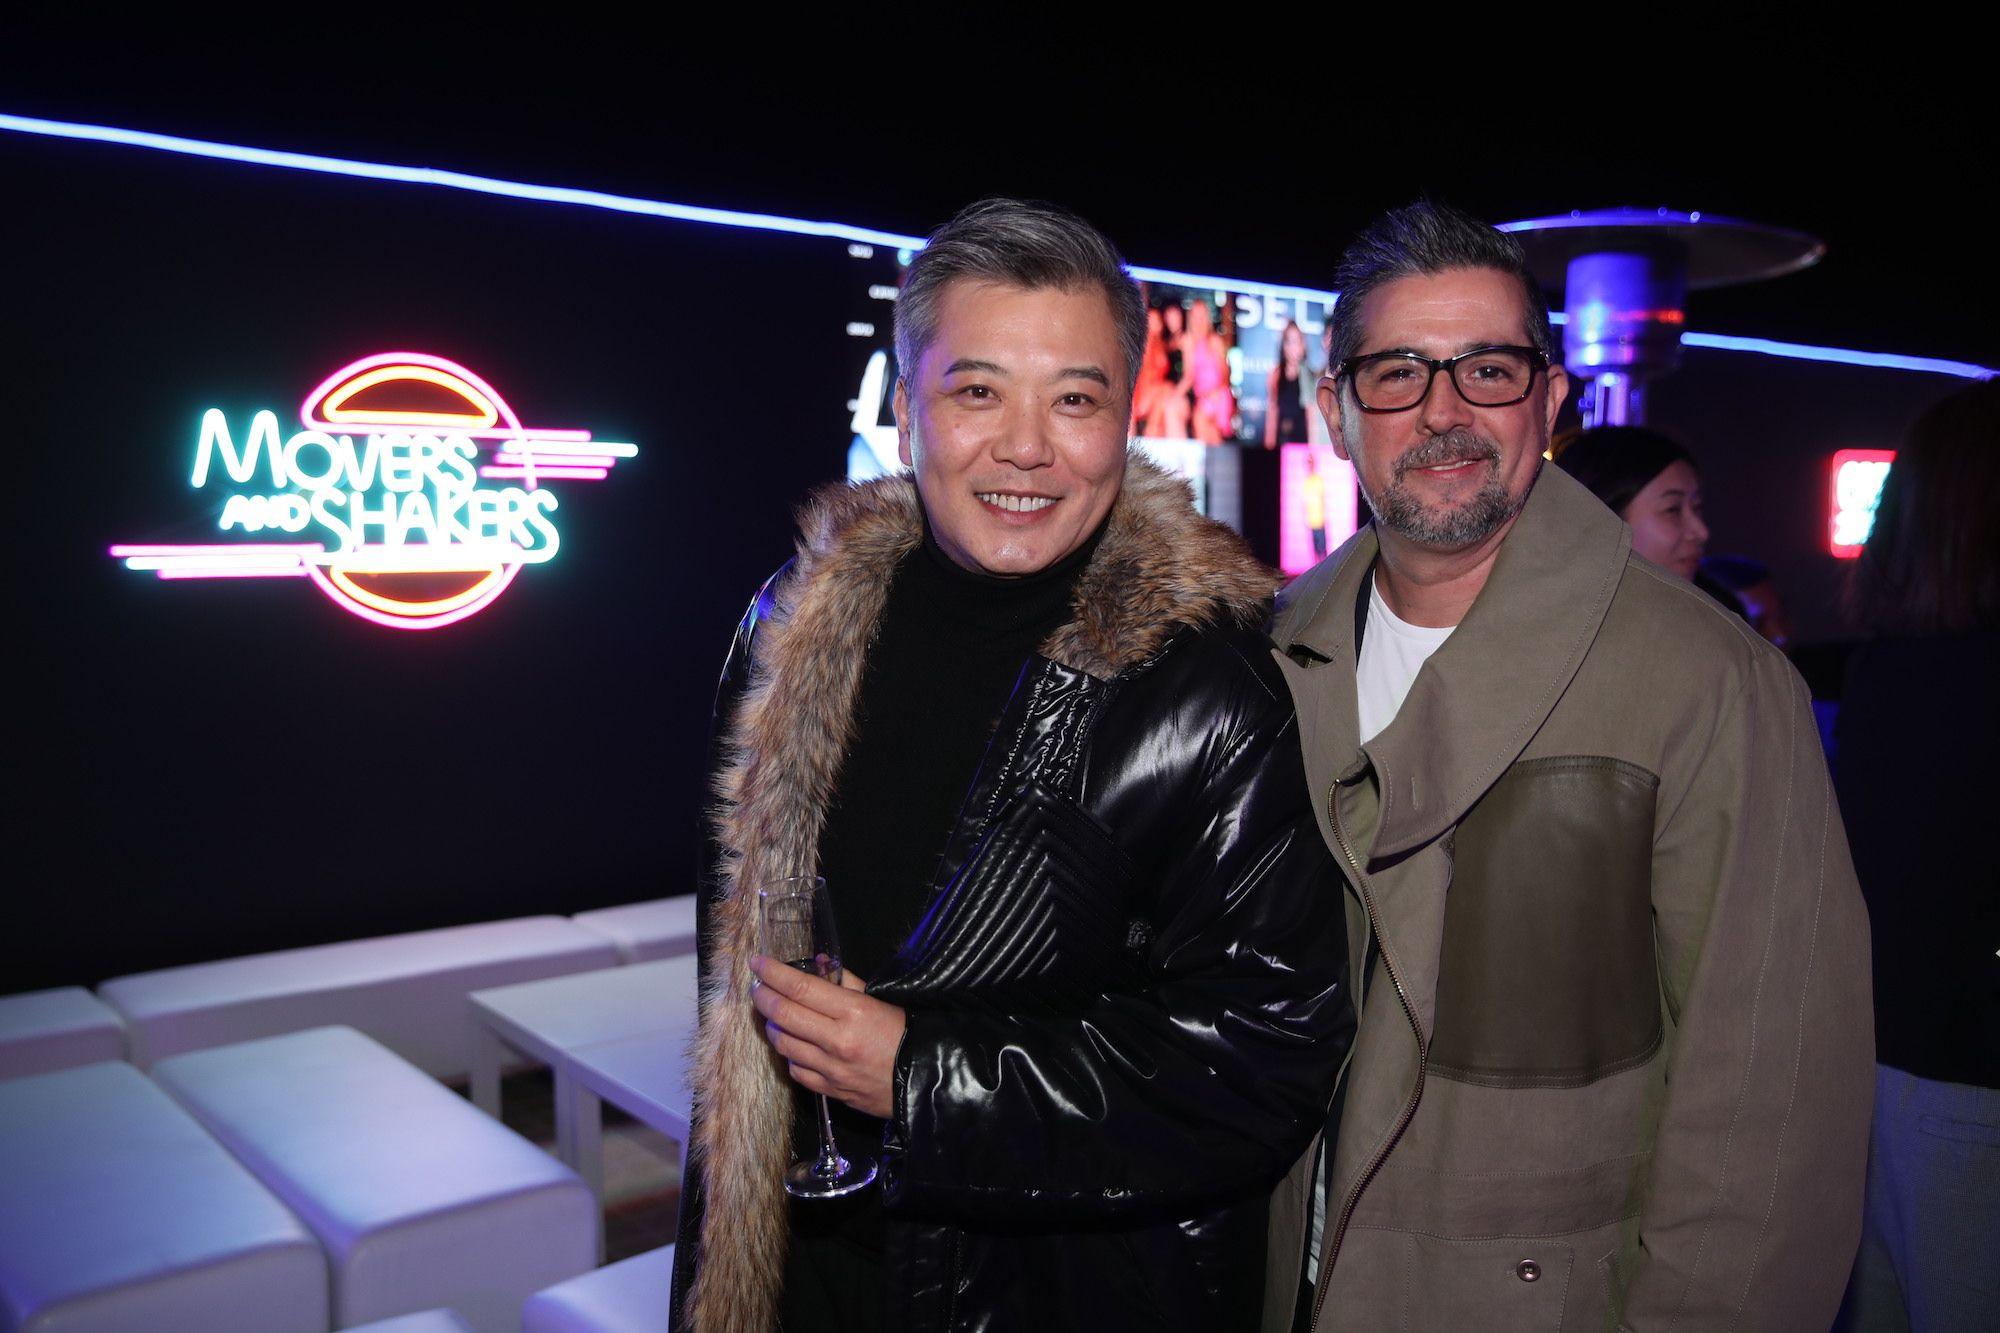 Peter Cheung, Francisco Anton-Serrano